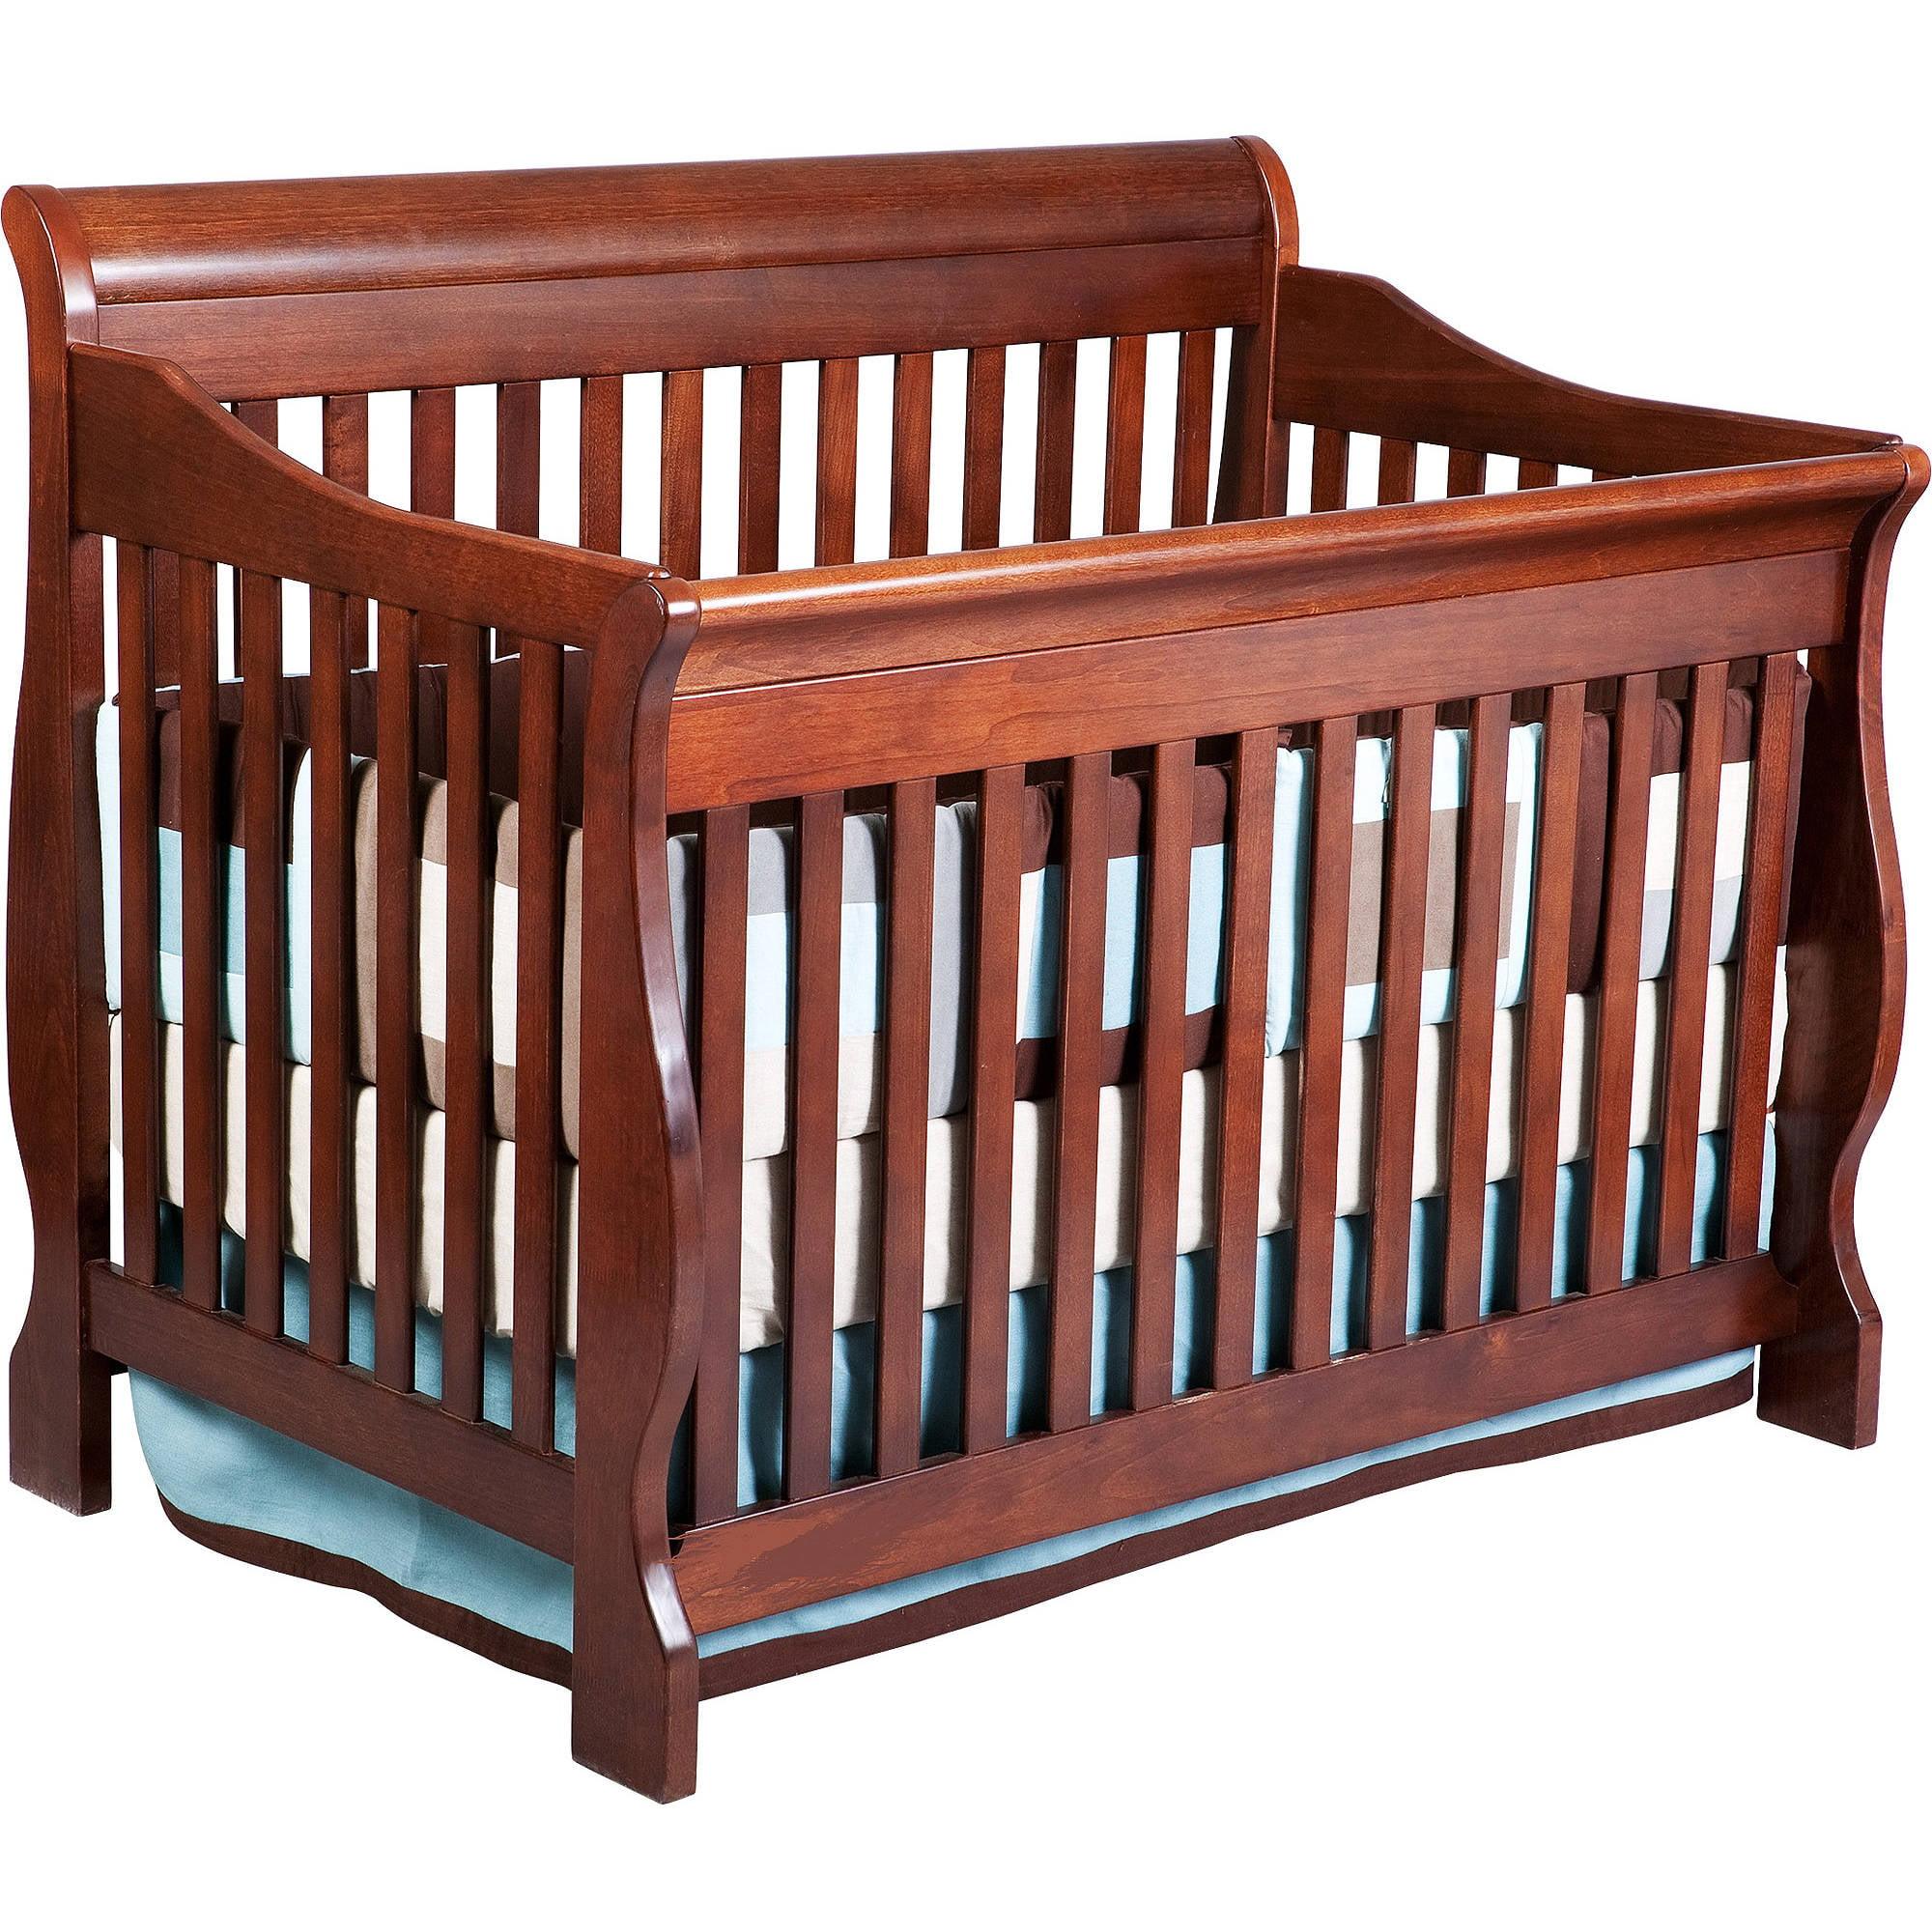 Delta Children Canton 4-in-1 Convertible Crib Cherry